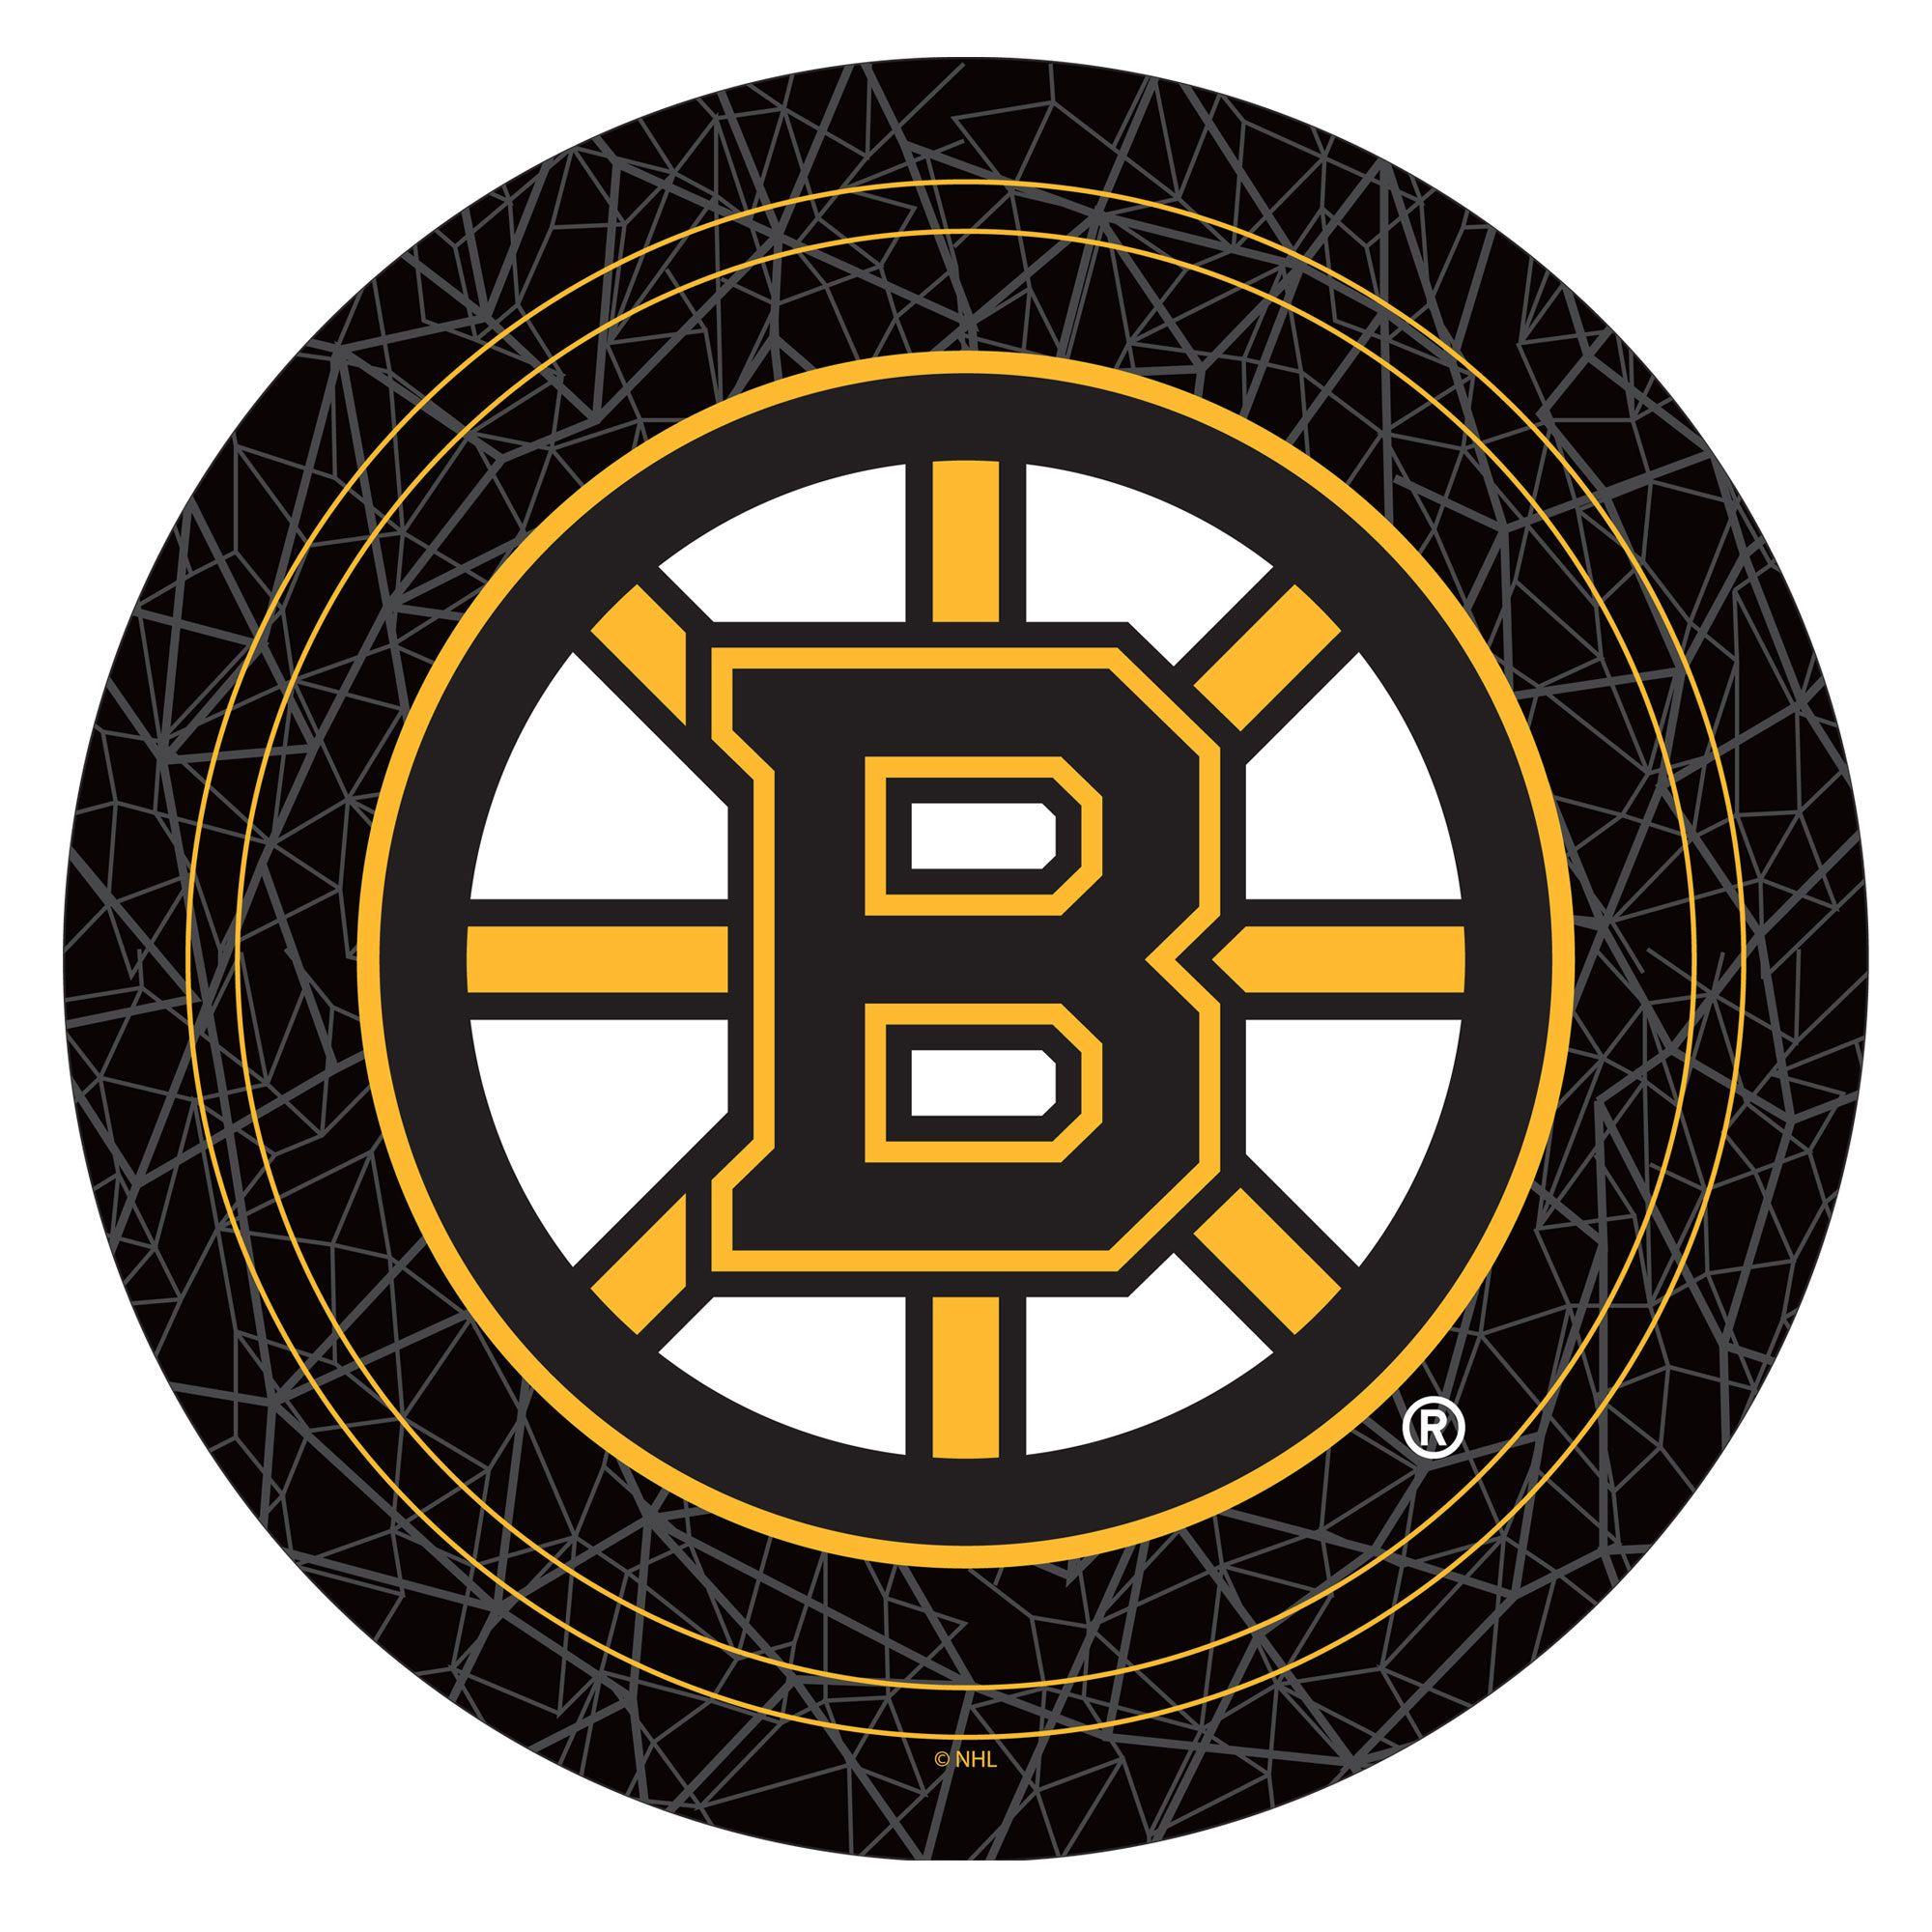 Boston Bruins Gameroom Combo - 2 Bar Stools and Table